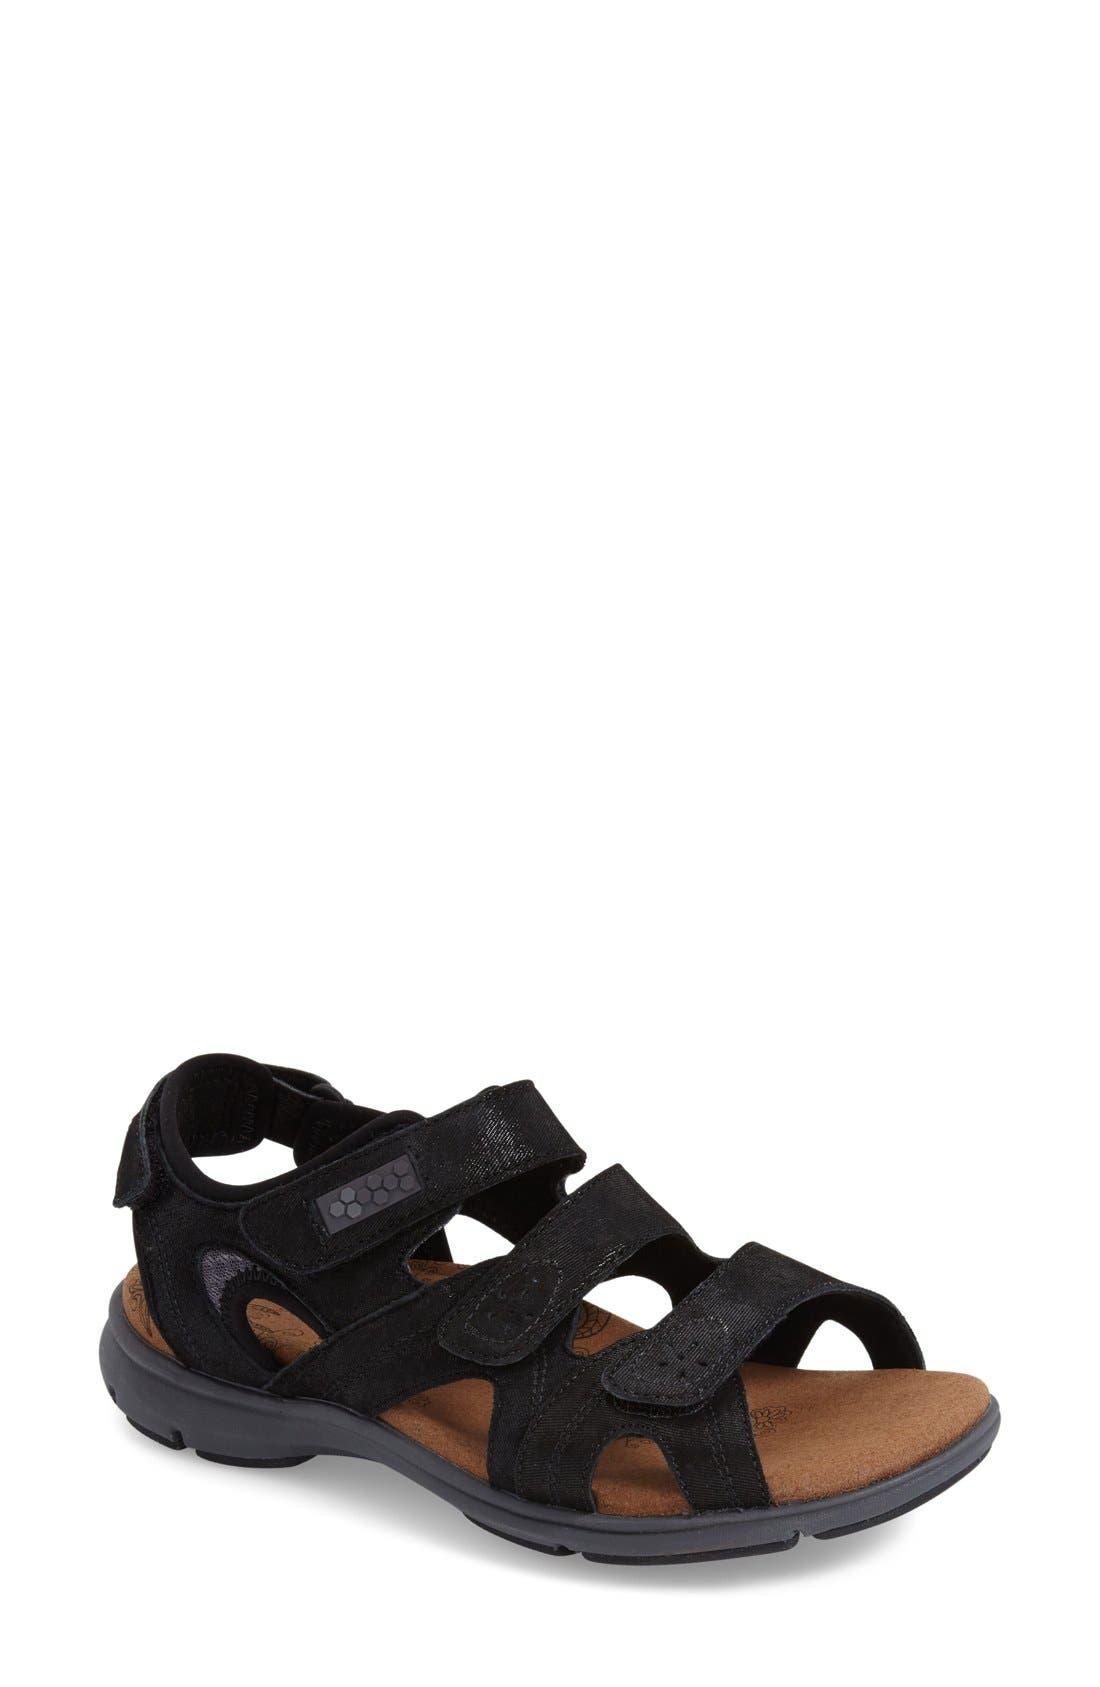 Alternate Image 1 Selected - Aravon 'REVsoleil' Sandal (Women)